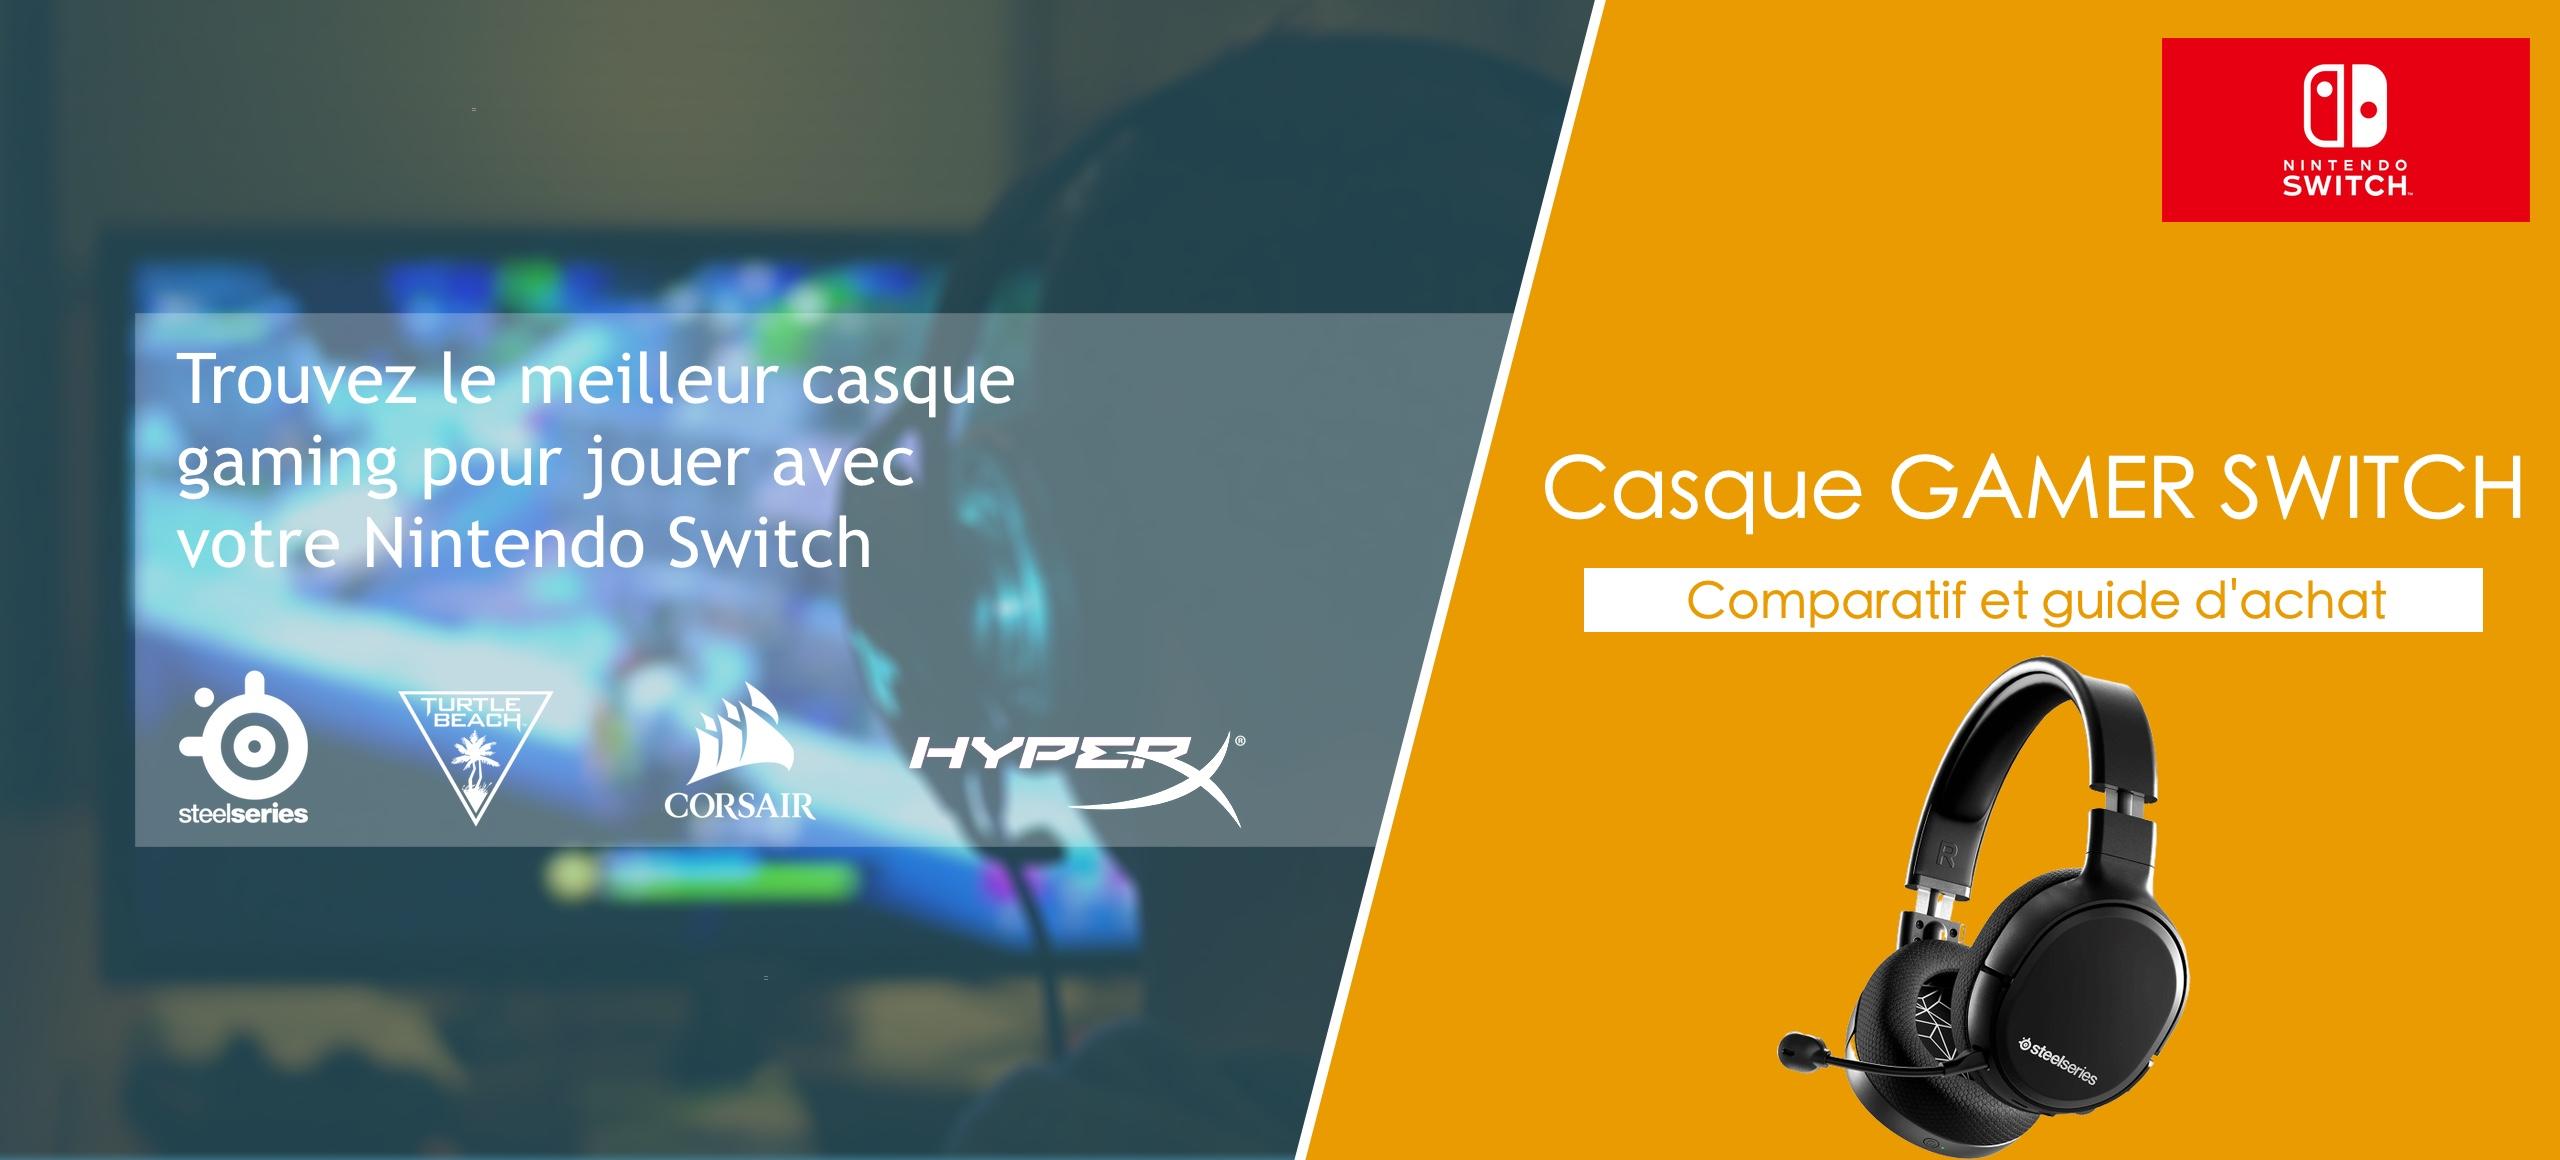 casque gamer switch